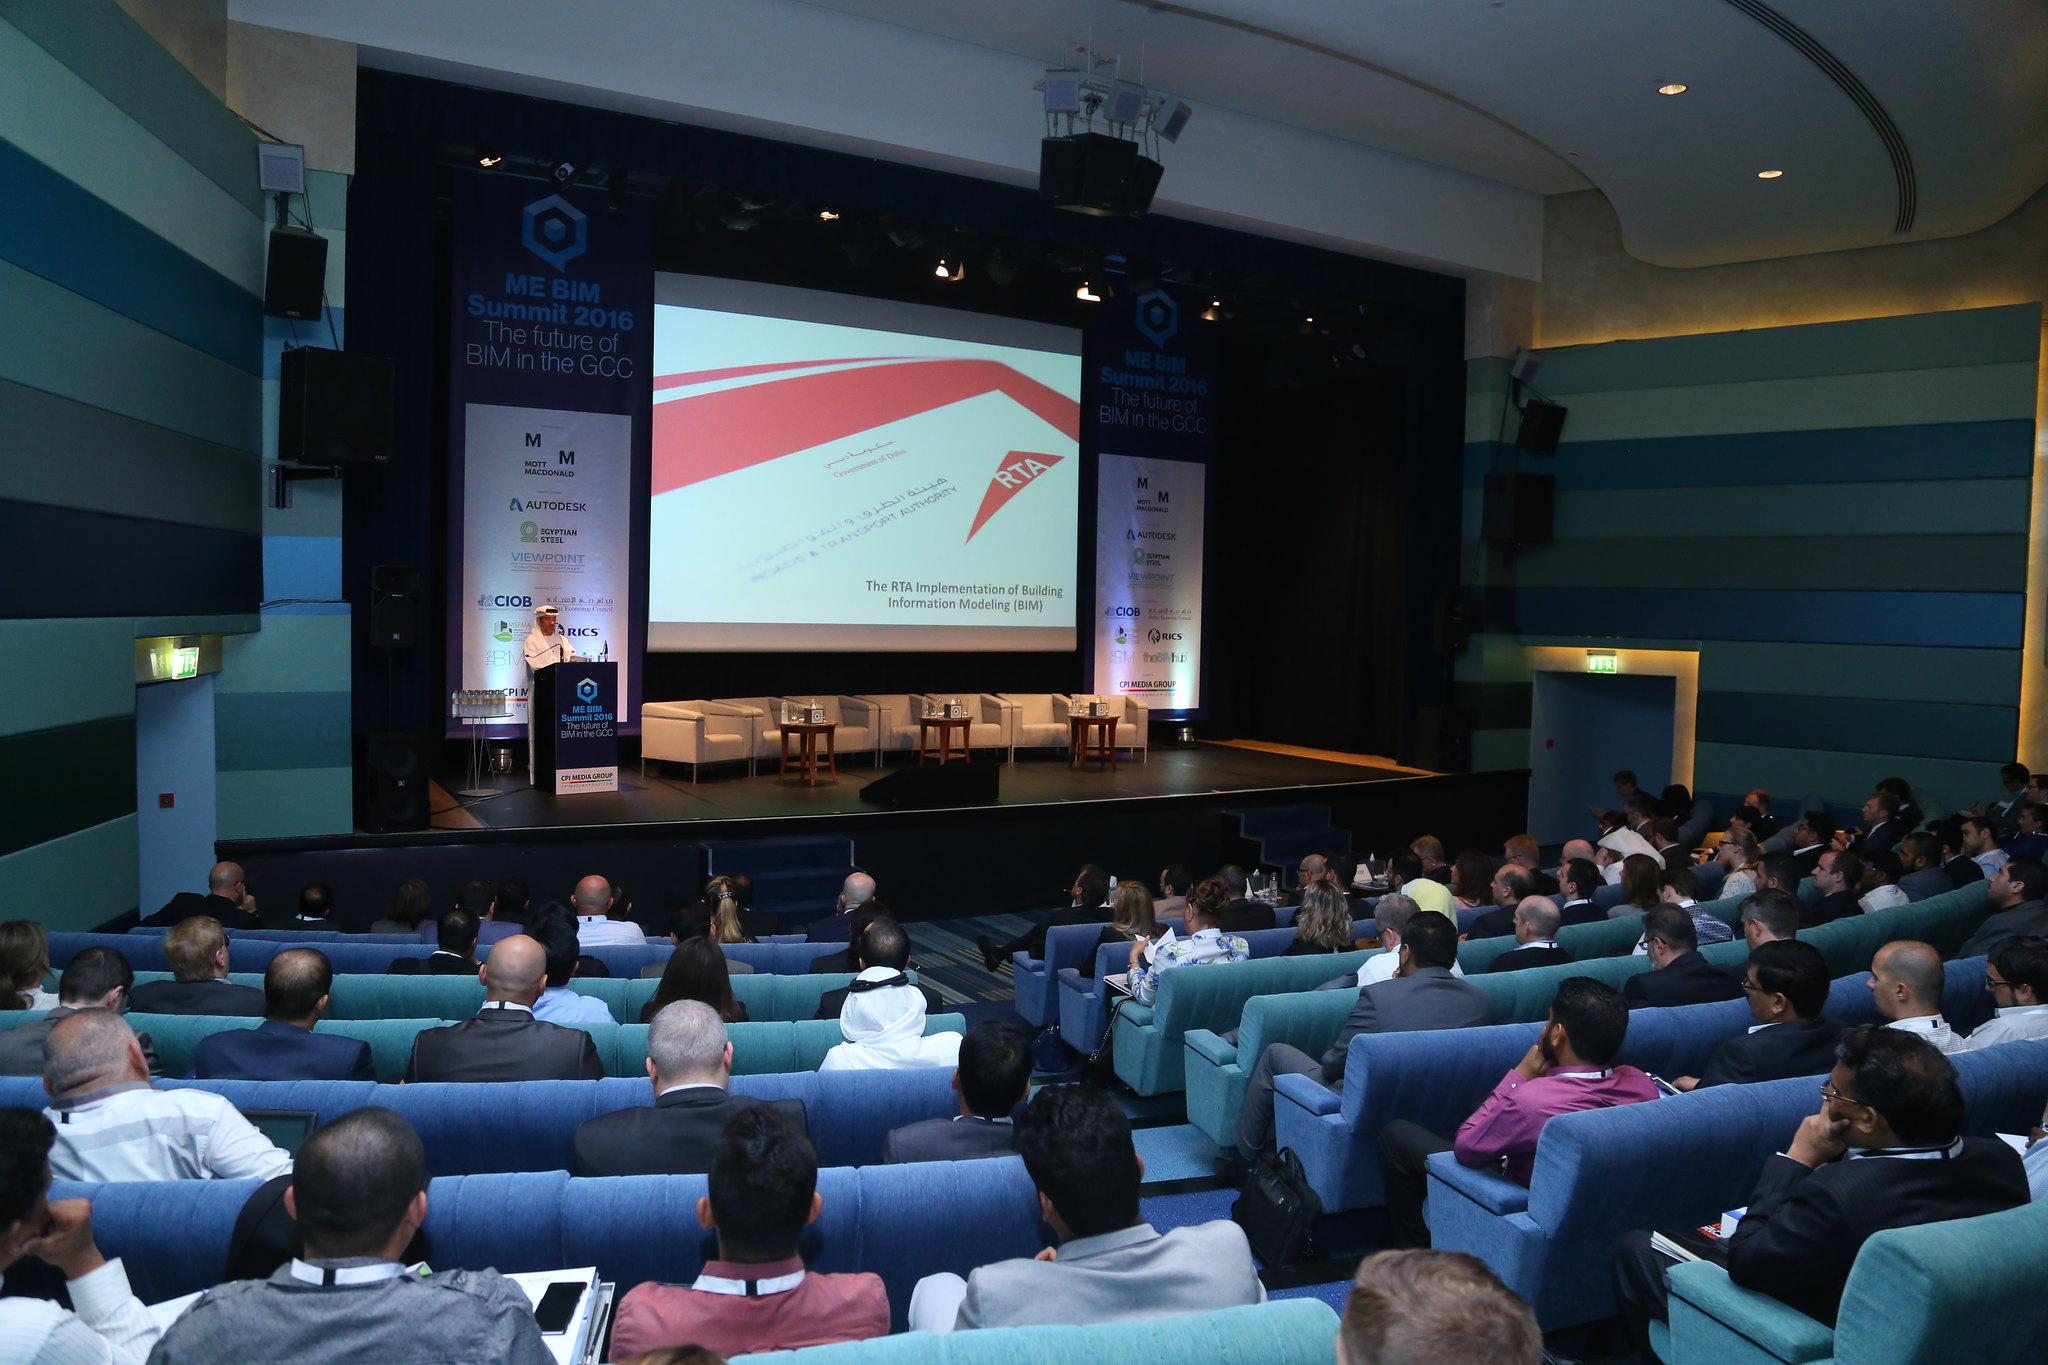 Middle East BIM Summit 2016